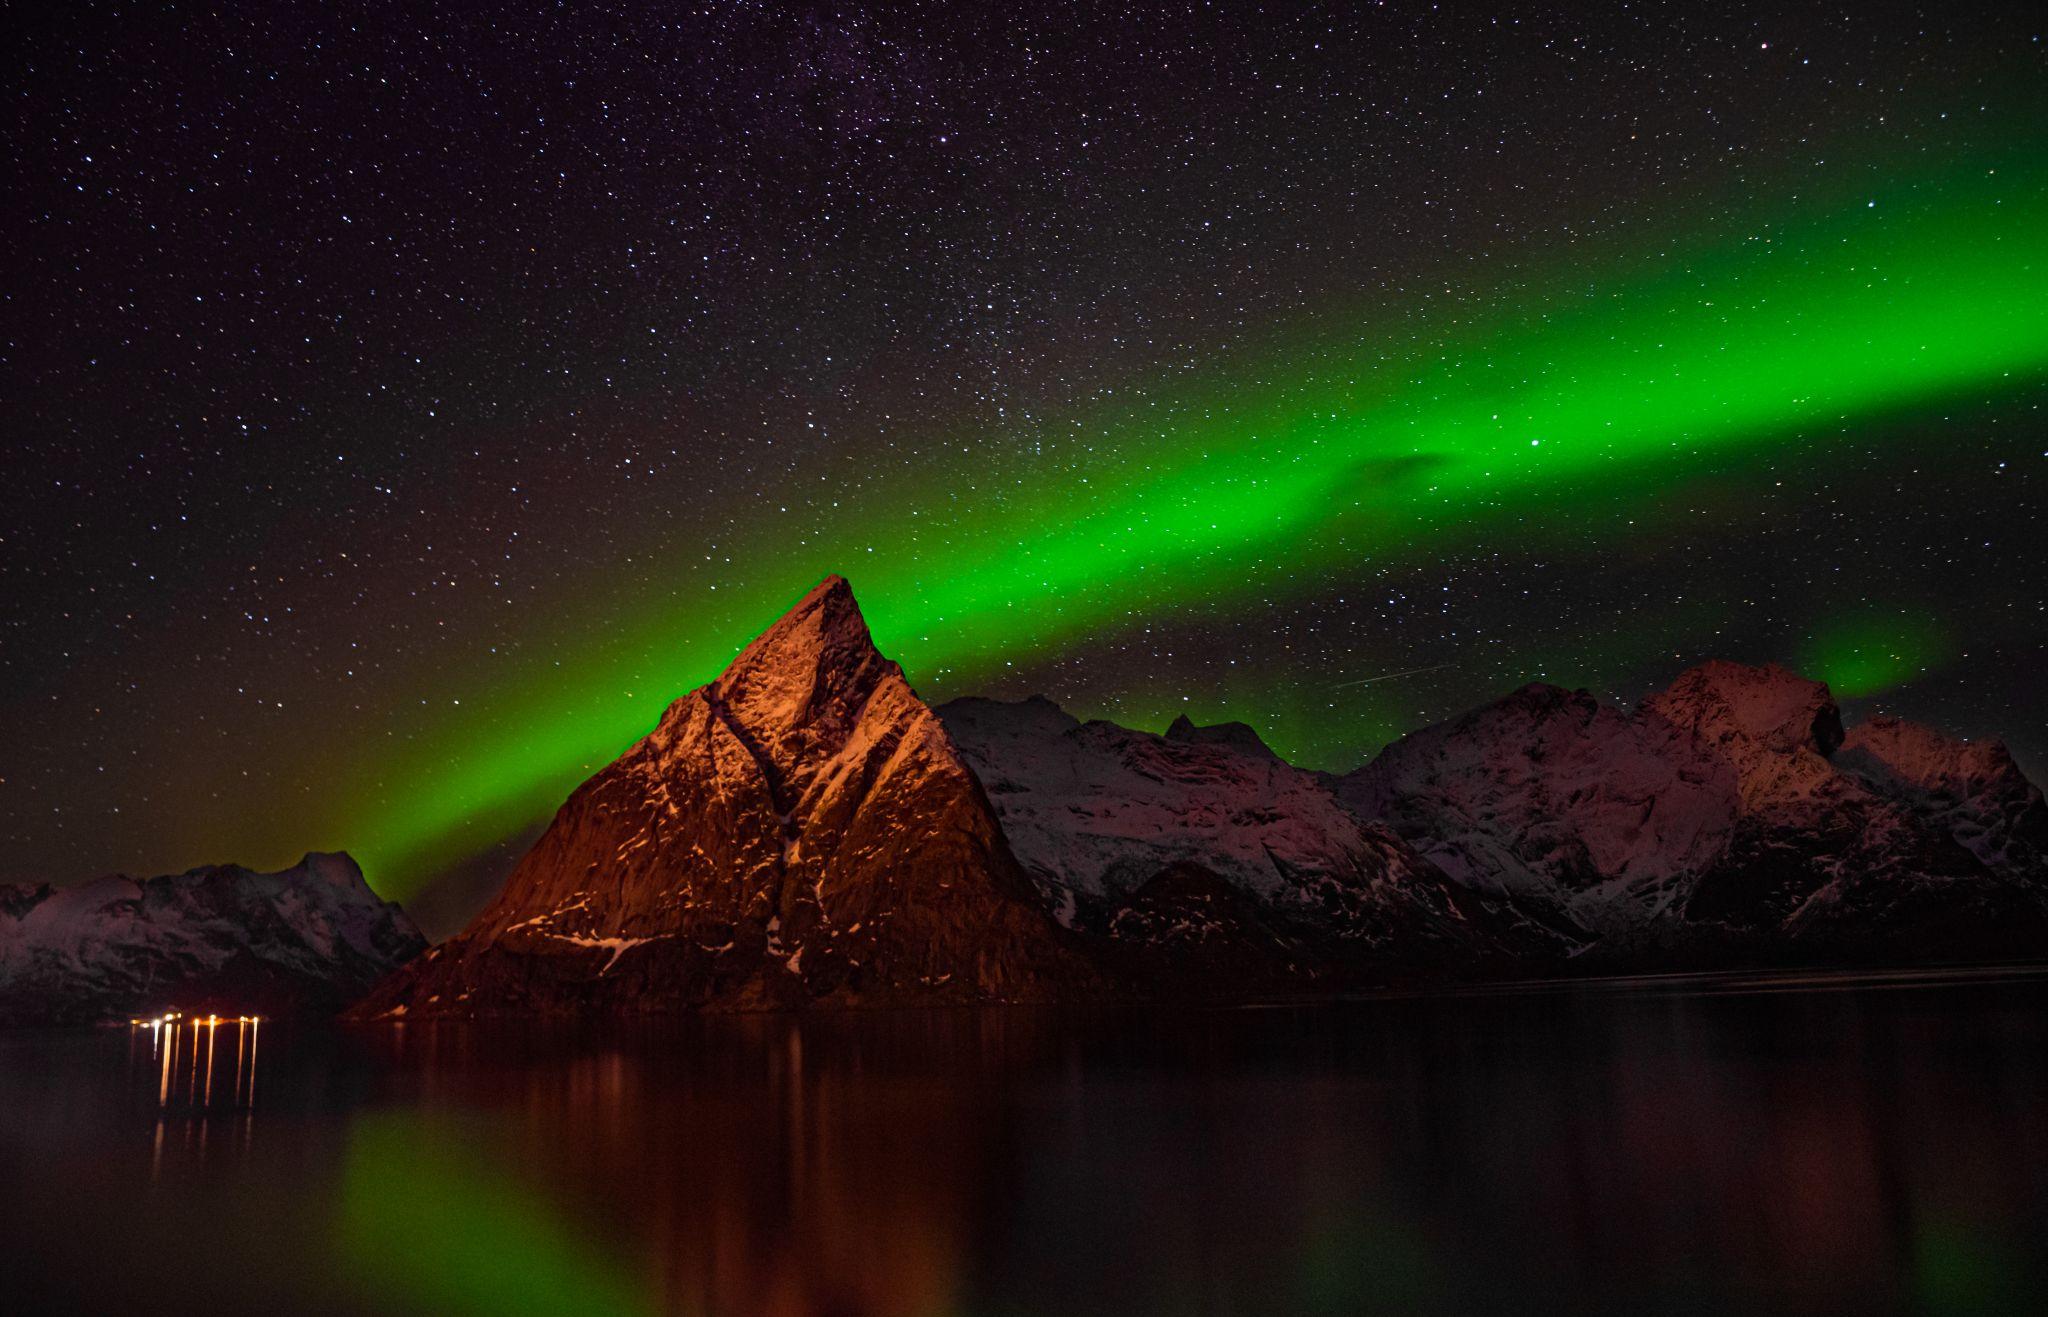 lille toppøya, Norway